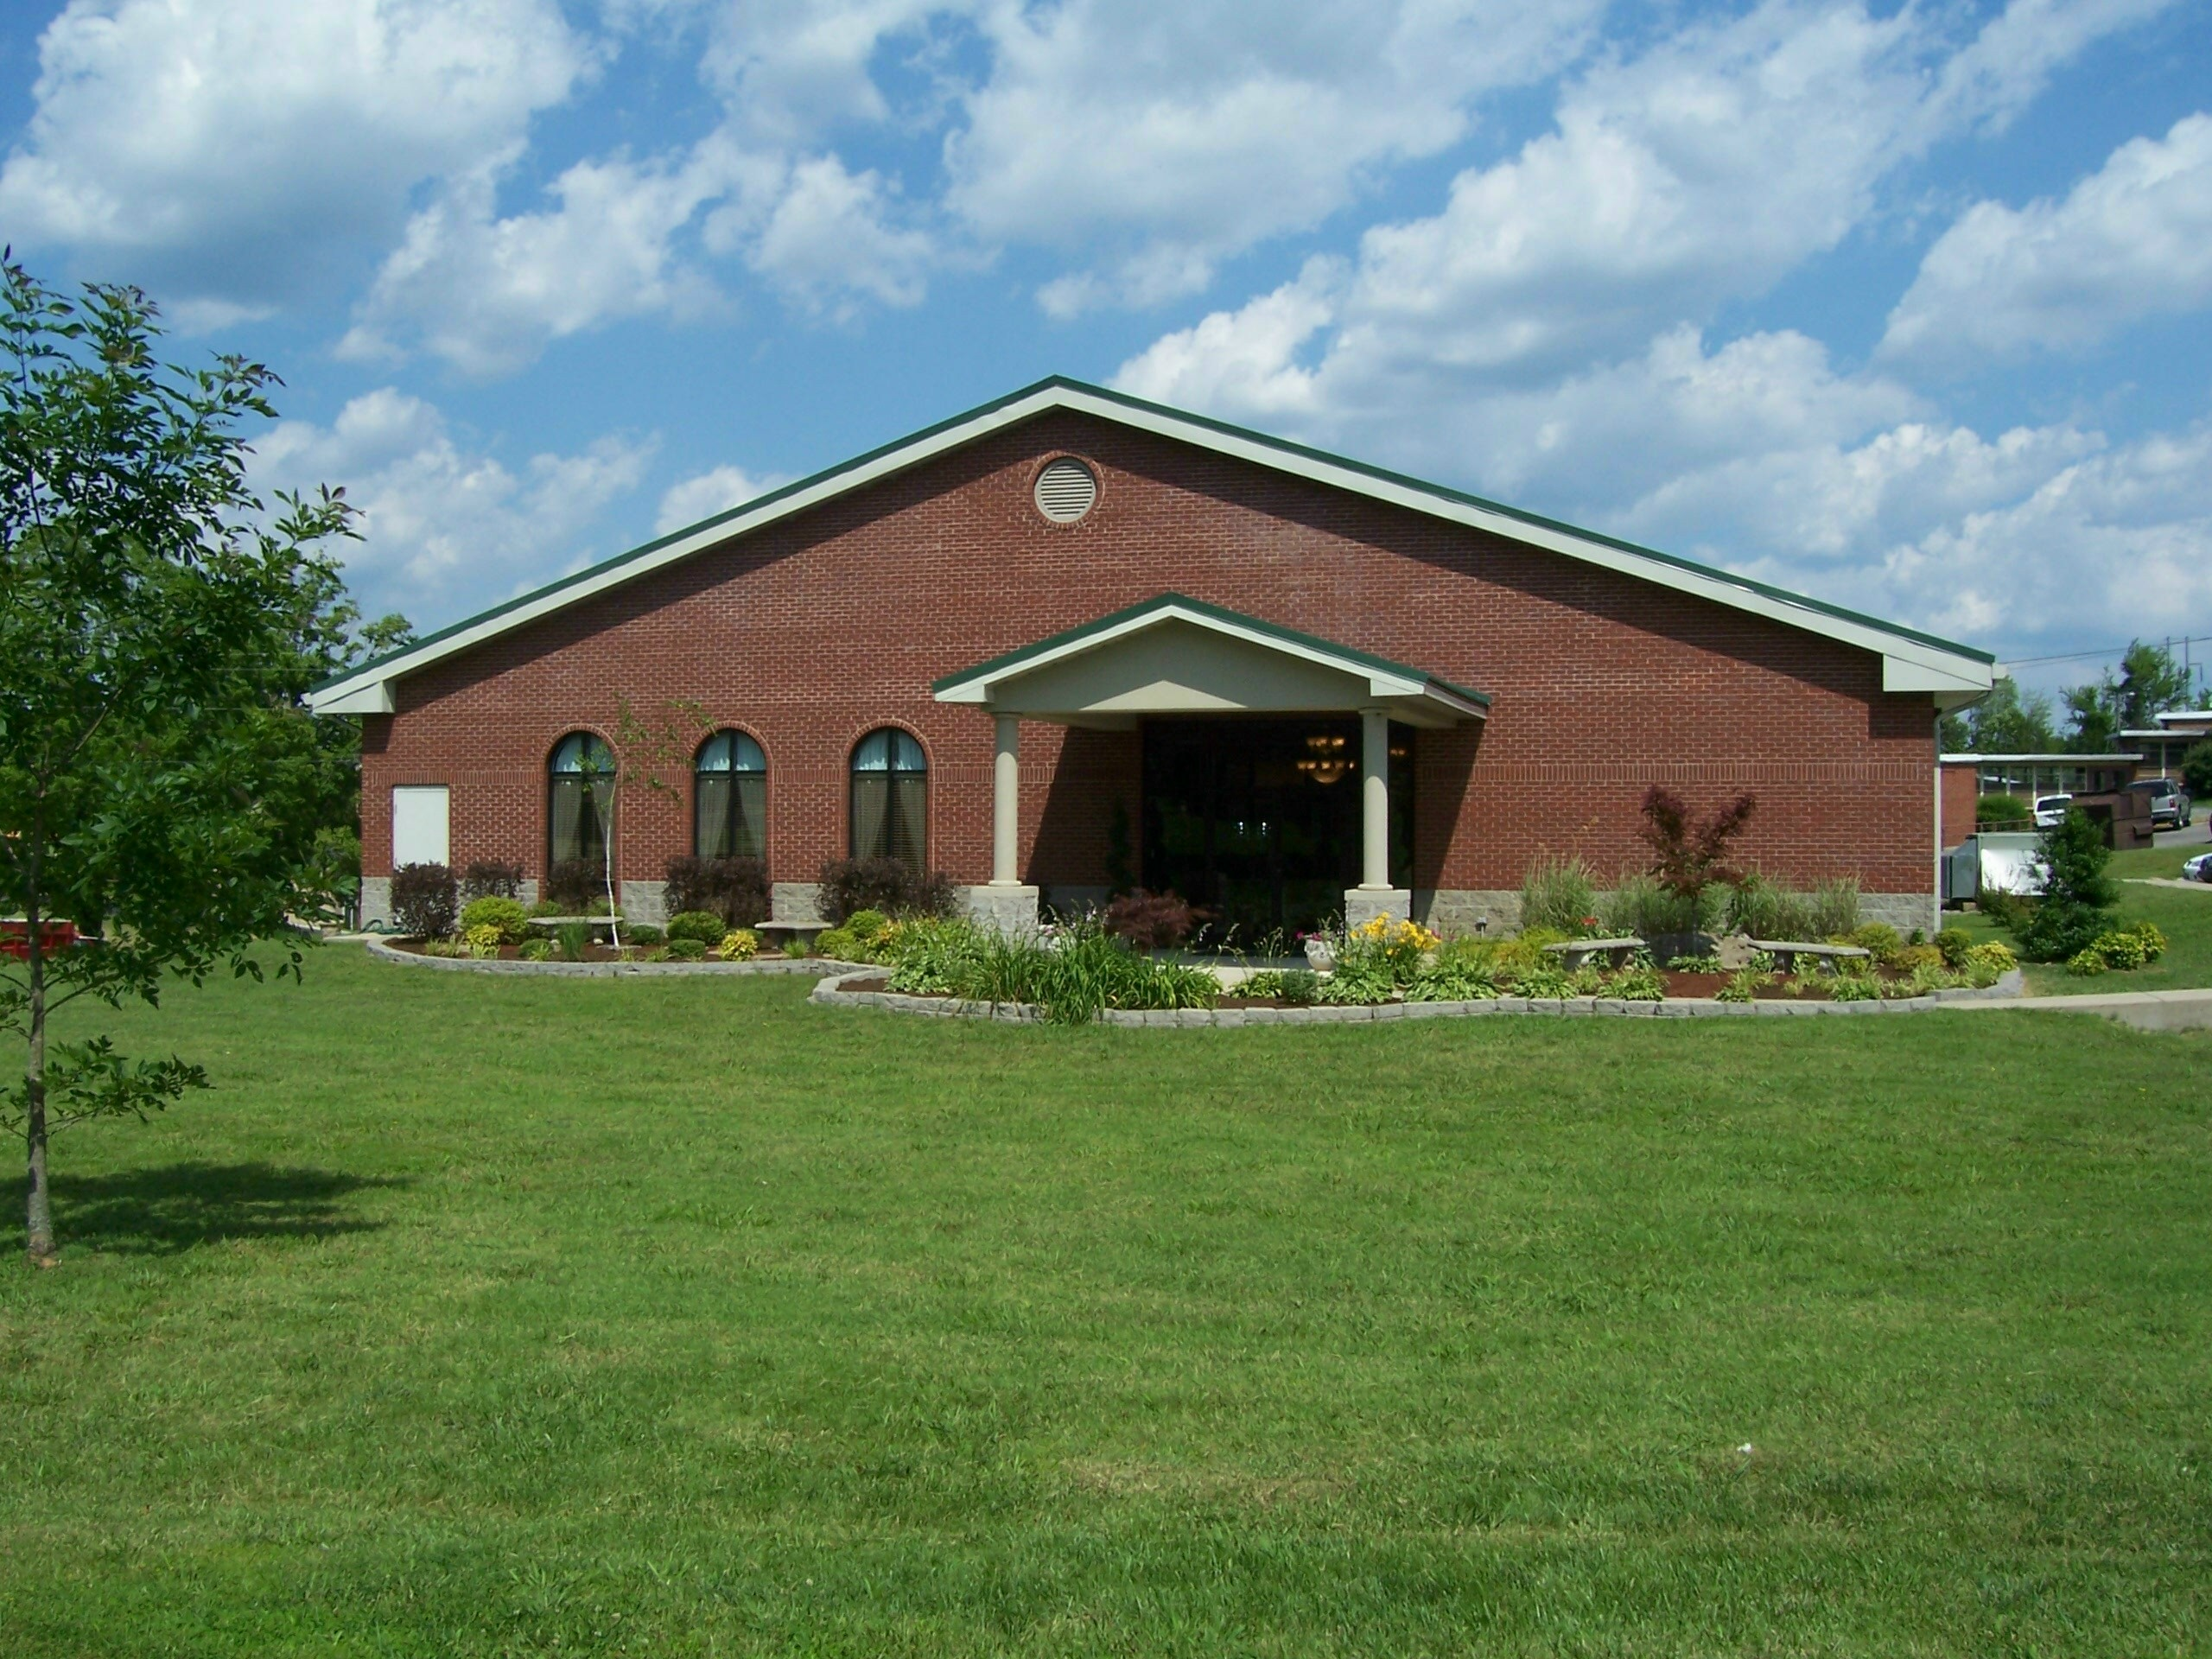 Stewart County Public Library